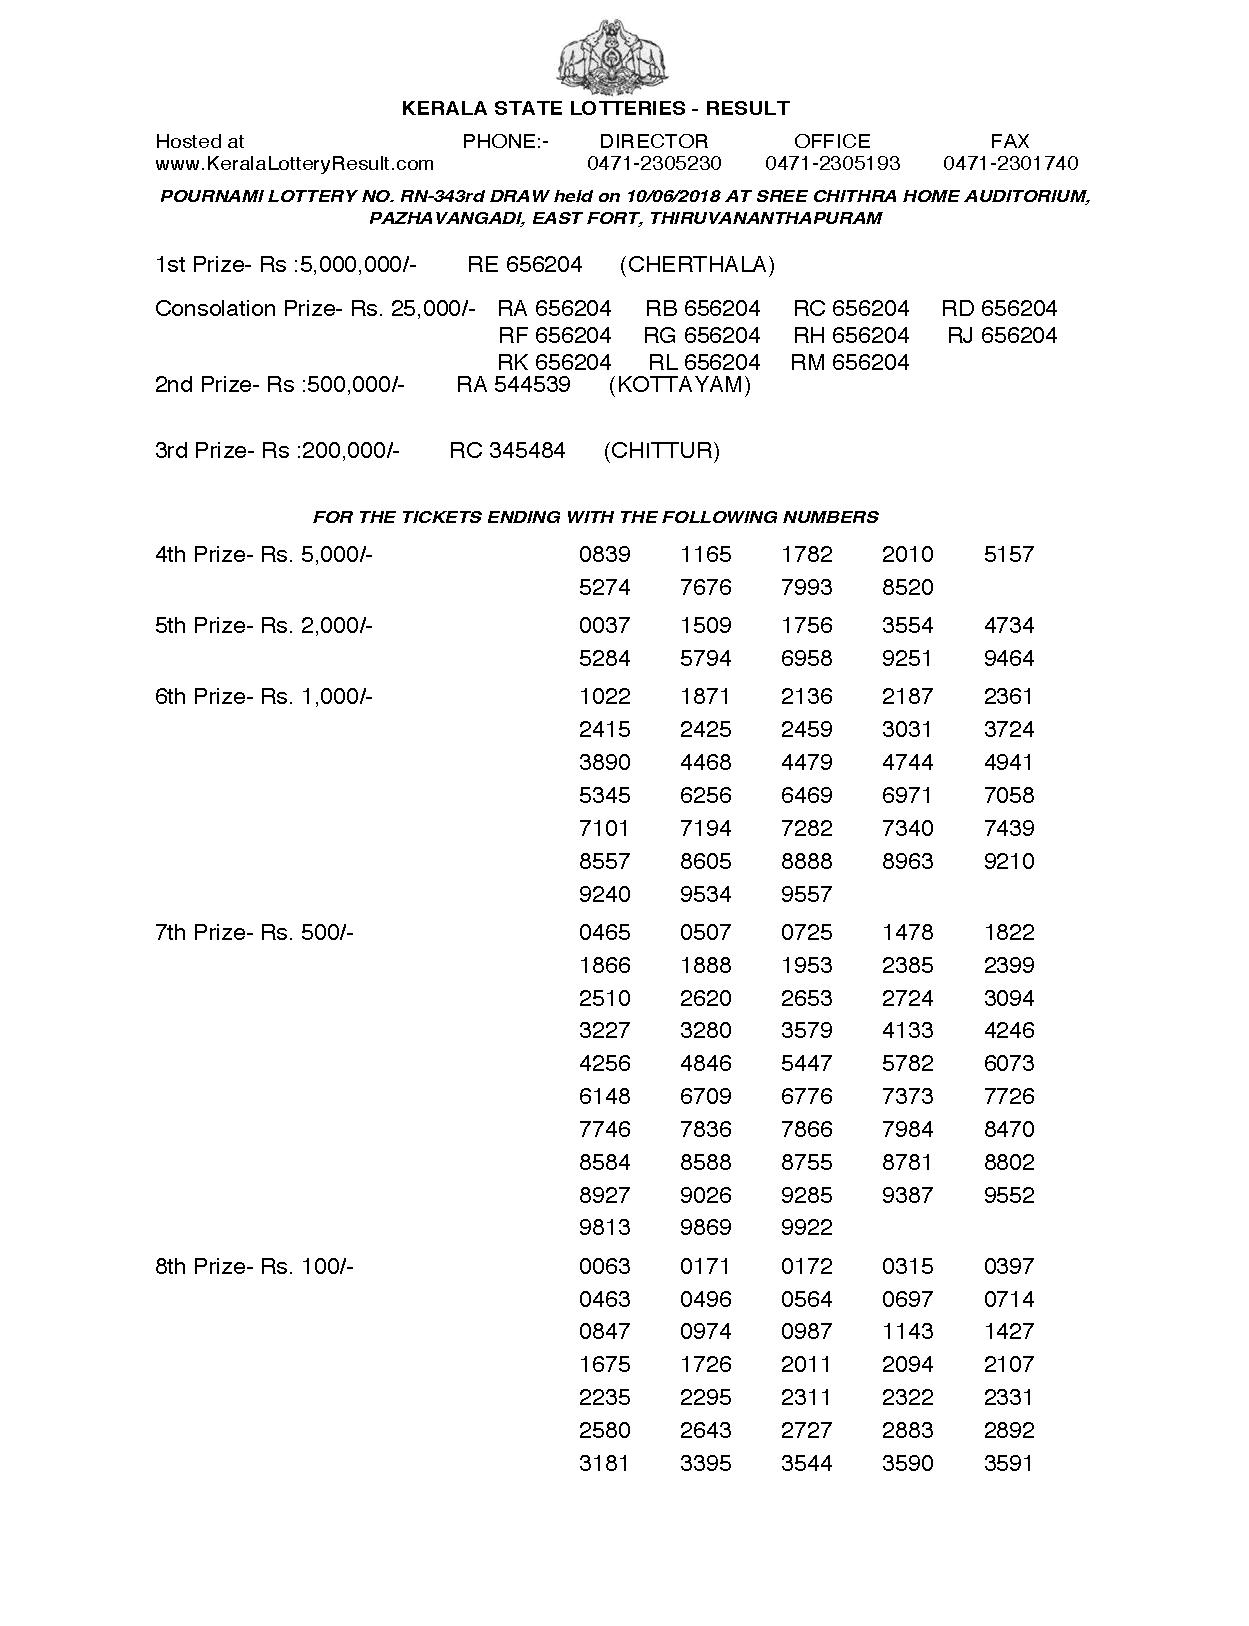 Pournami RN343 Kerala Lottery Results Screenshot: Page 1